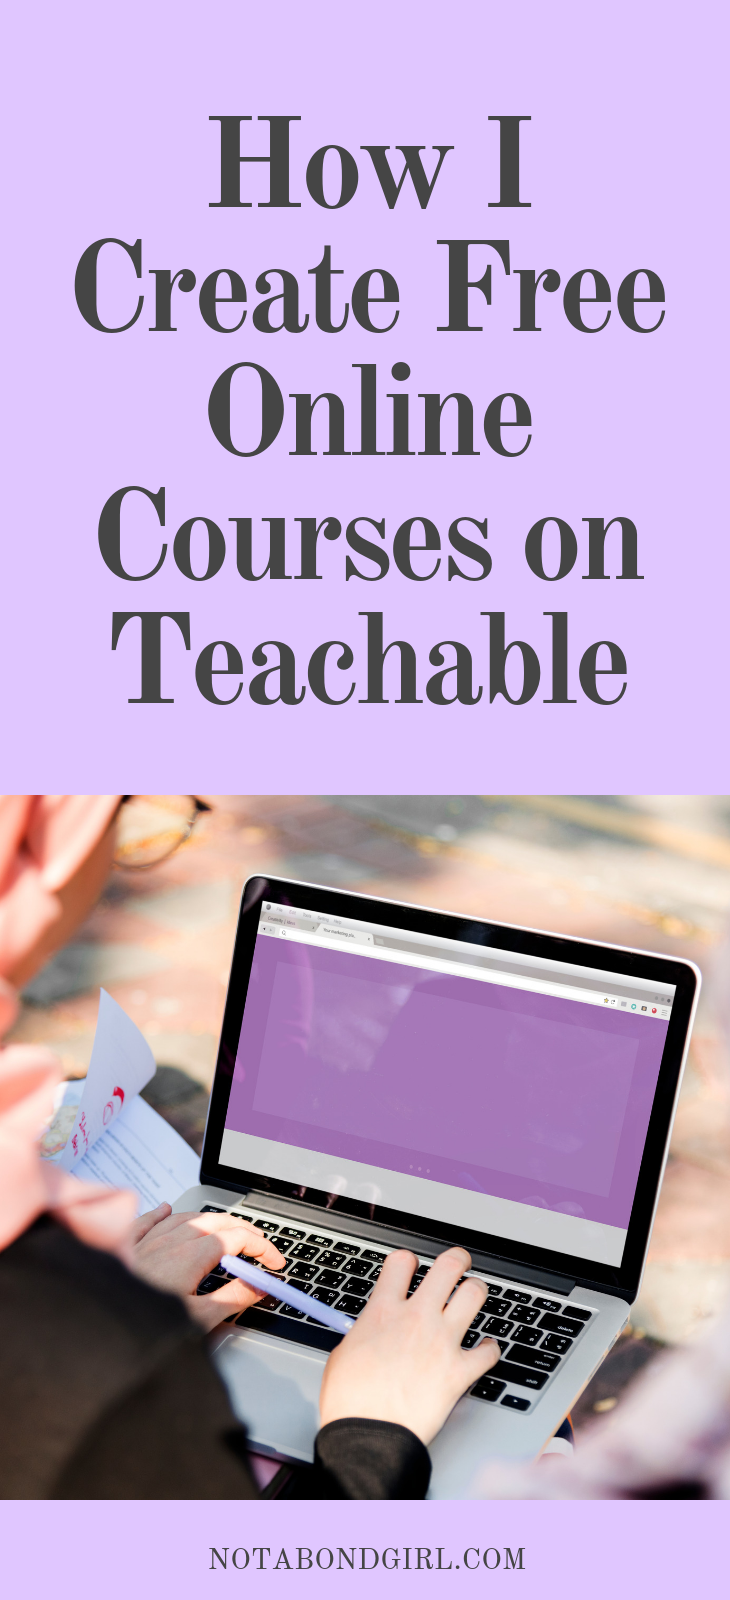 How I Create Online Courses on Teachable for Free; #entrepreneur #onlinebiz #solopreneur #blogger #girlboss #bossbabe #teachable #education #millennial #personalfinance #financialfreedom #blog #bloggingtips